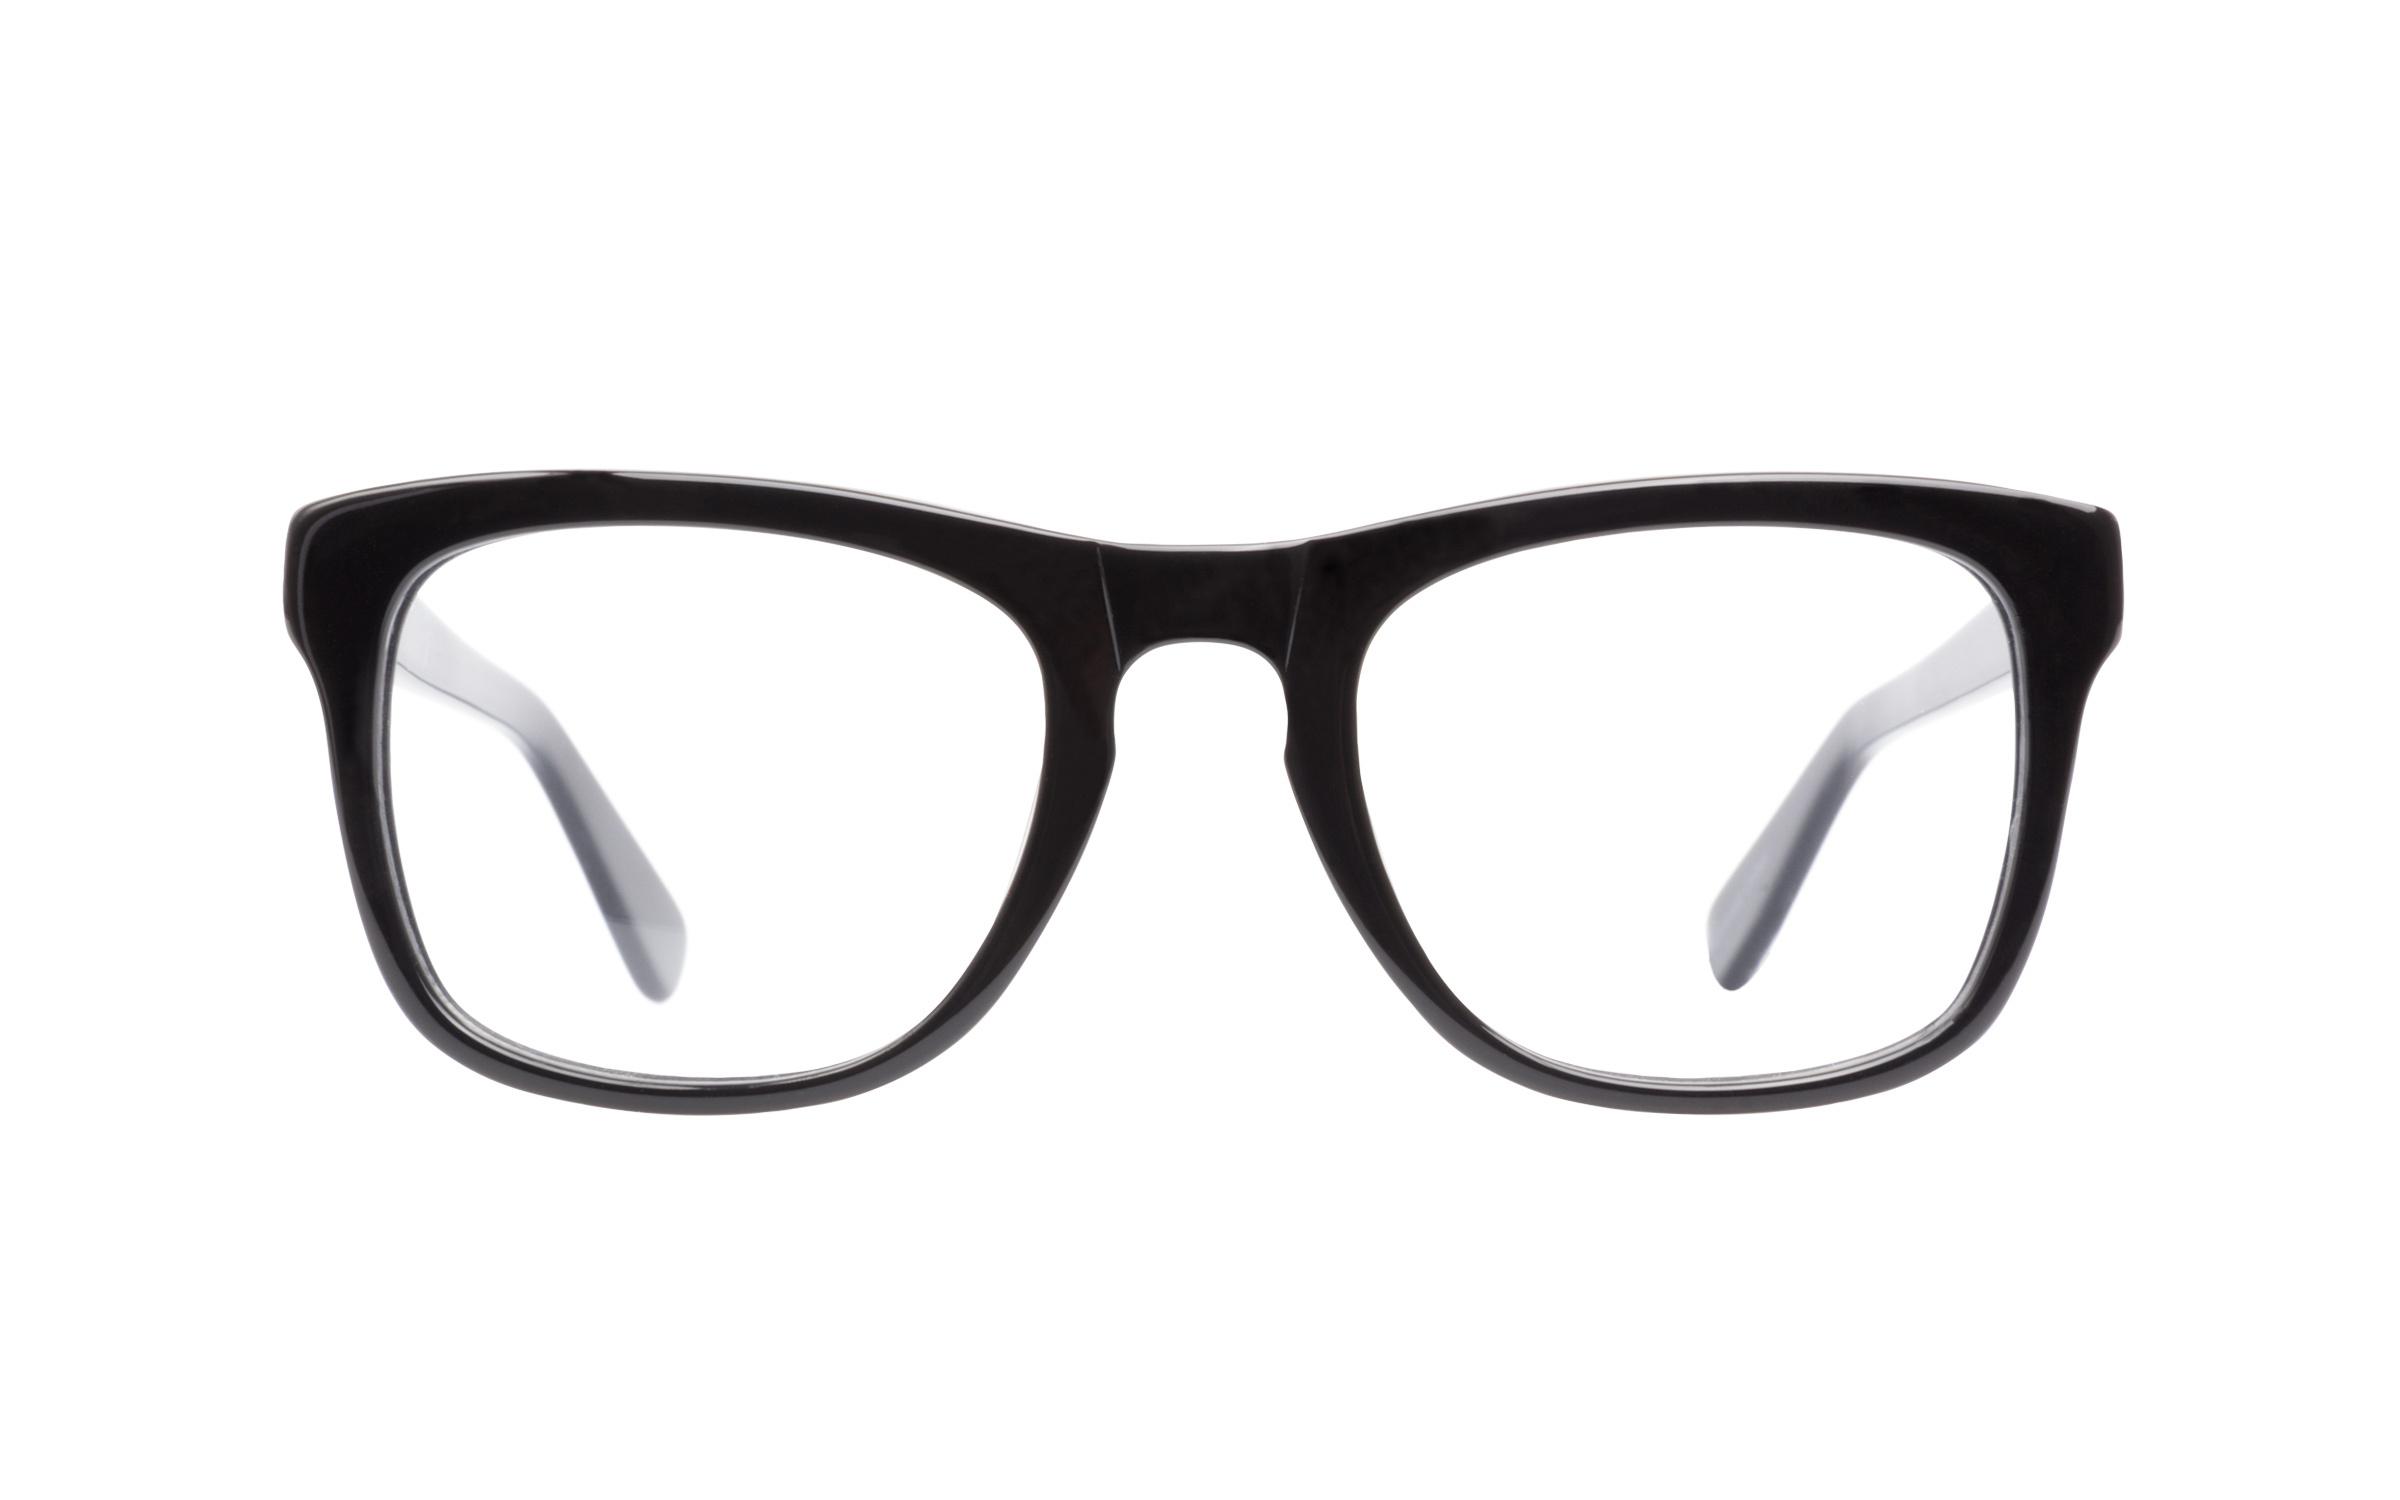 Square_Glasses_Black_7_for_All_Mankind_Online_Coastal